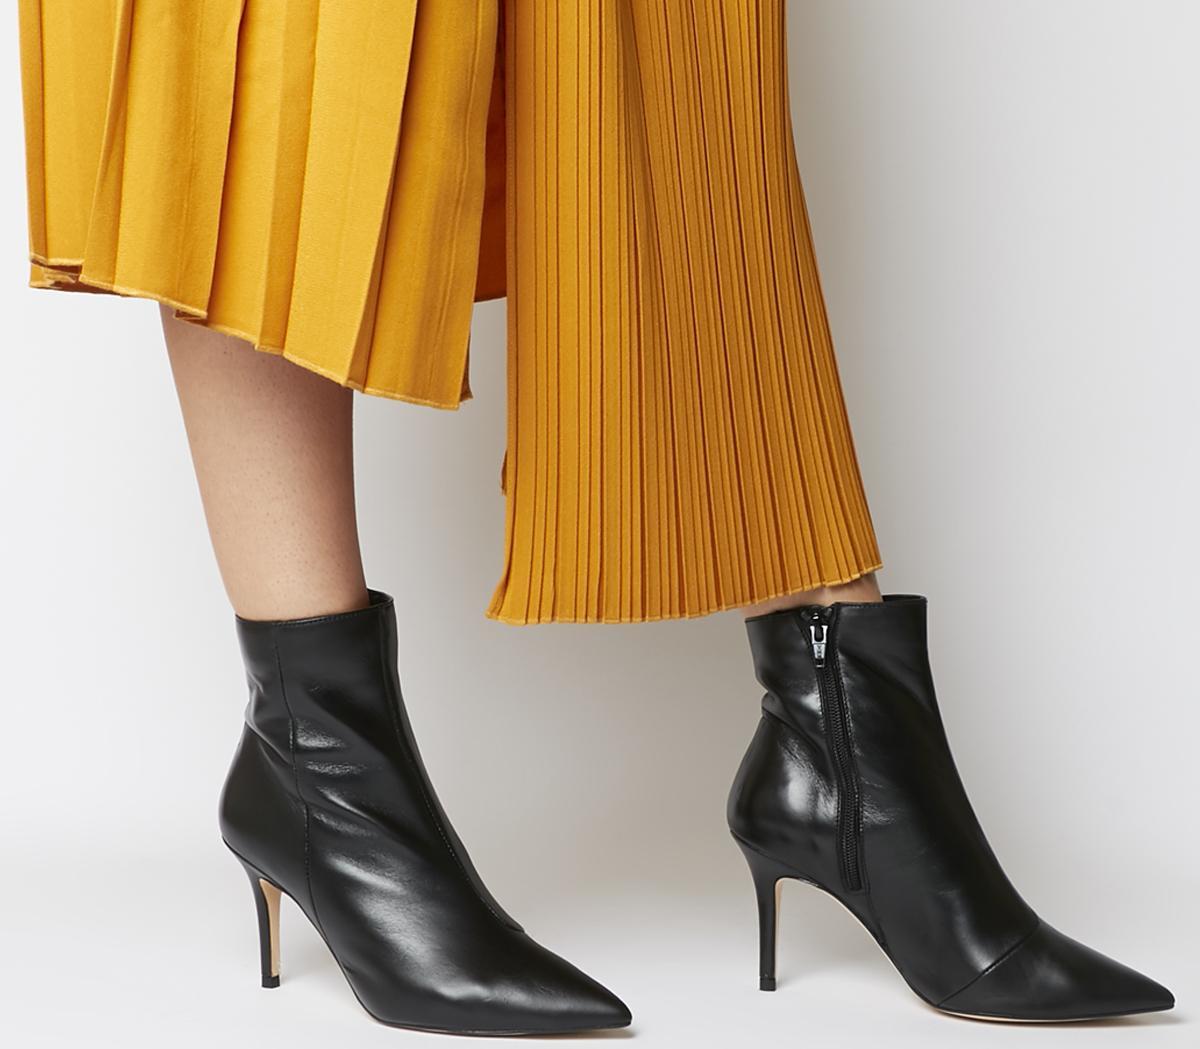 Office Acquaint Dressy Stiletto Boots